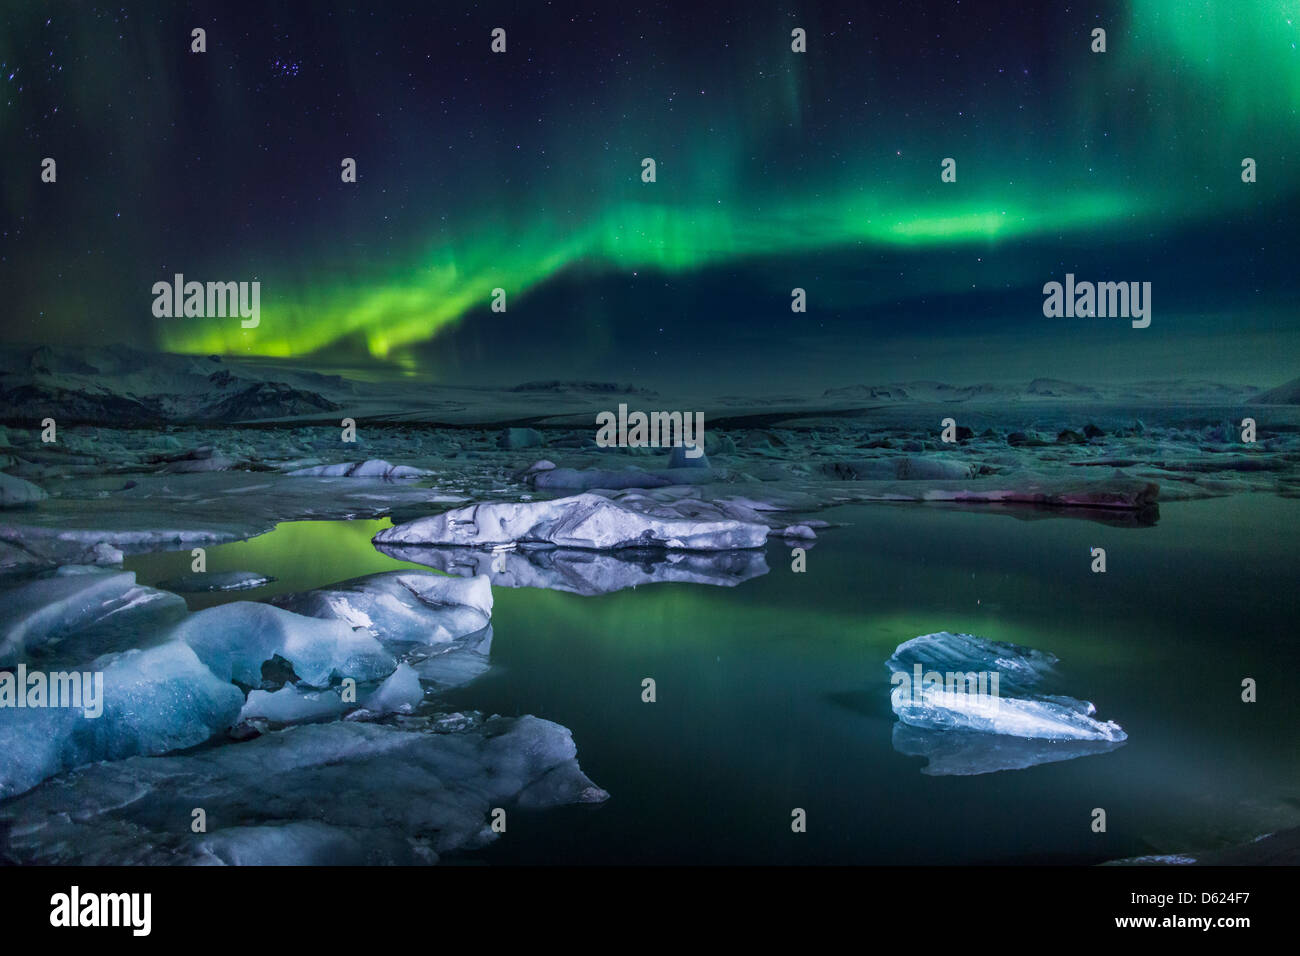 Aurora Boreale o luci del nord a Jokulsarlon, Breidarmerkurjokull Vatnajokull calotta di ghiaccio, Islanda Immagini Stock